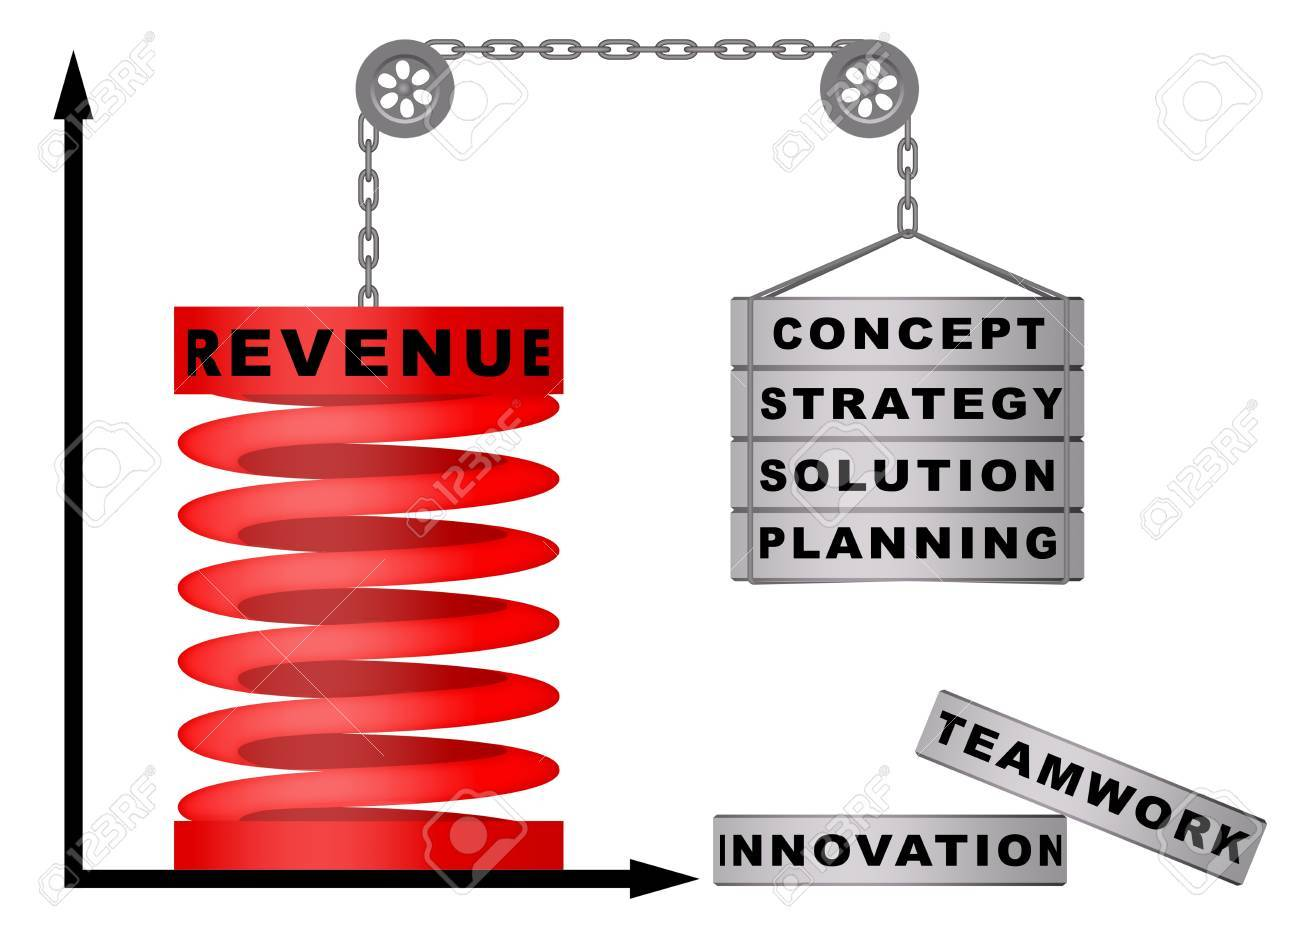 Company revenue growth concept Stock Photo - 13110070